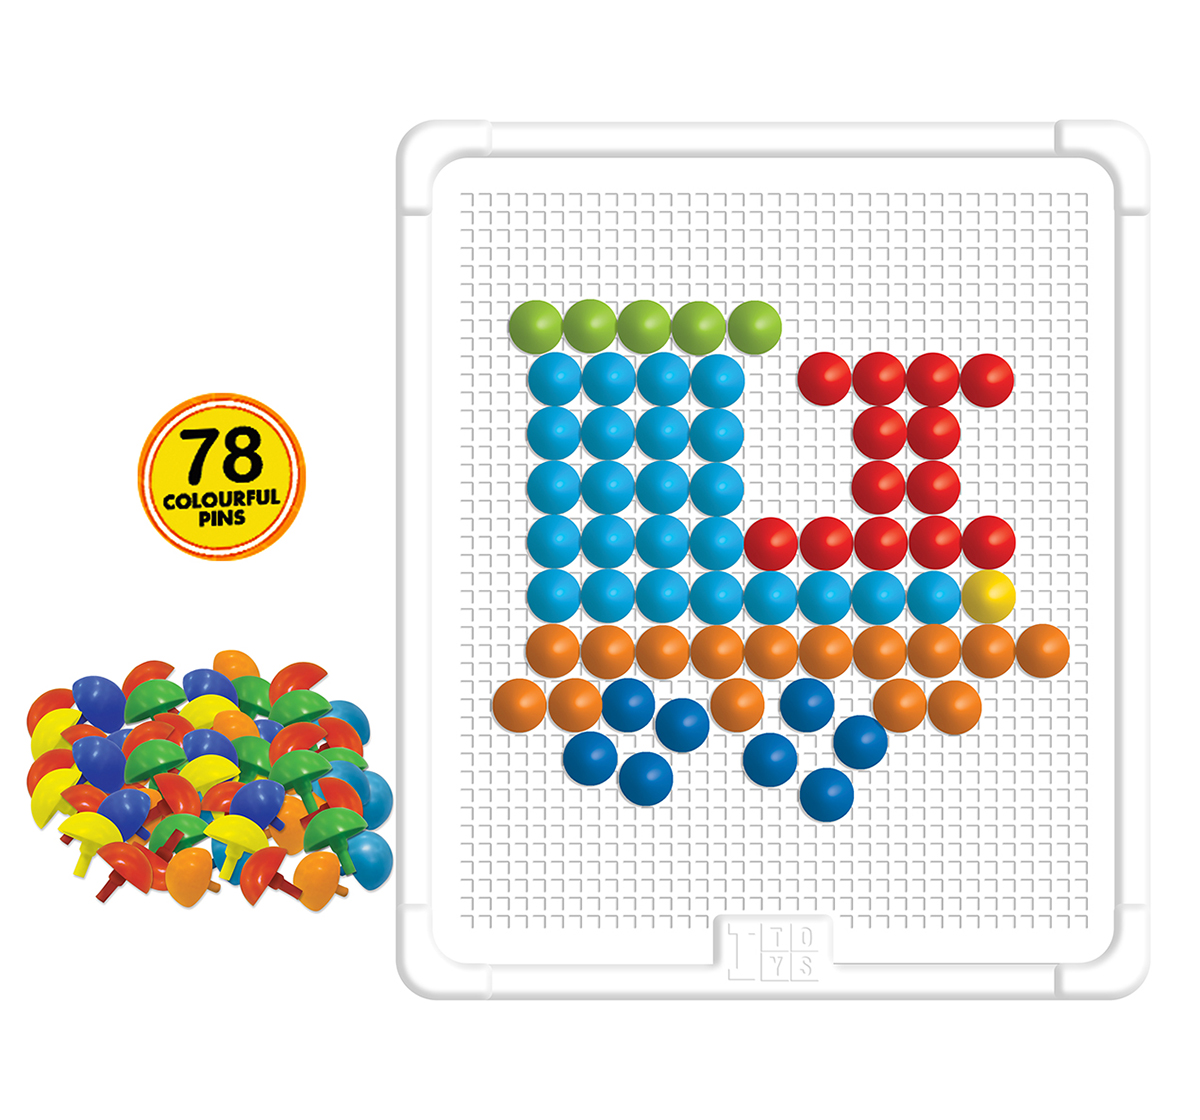 Itoys | I Toys Edu Wonder pattern Board for kids, 3Y+